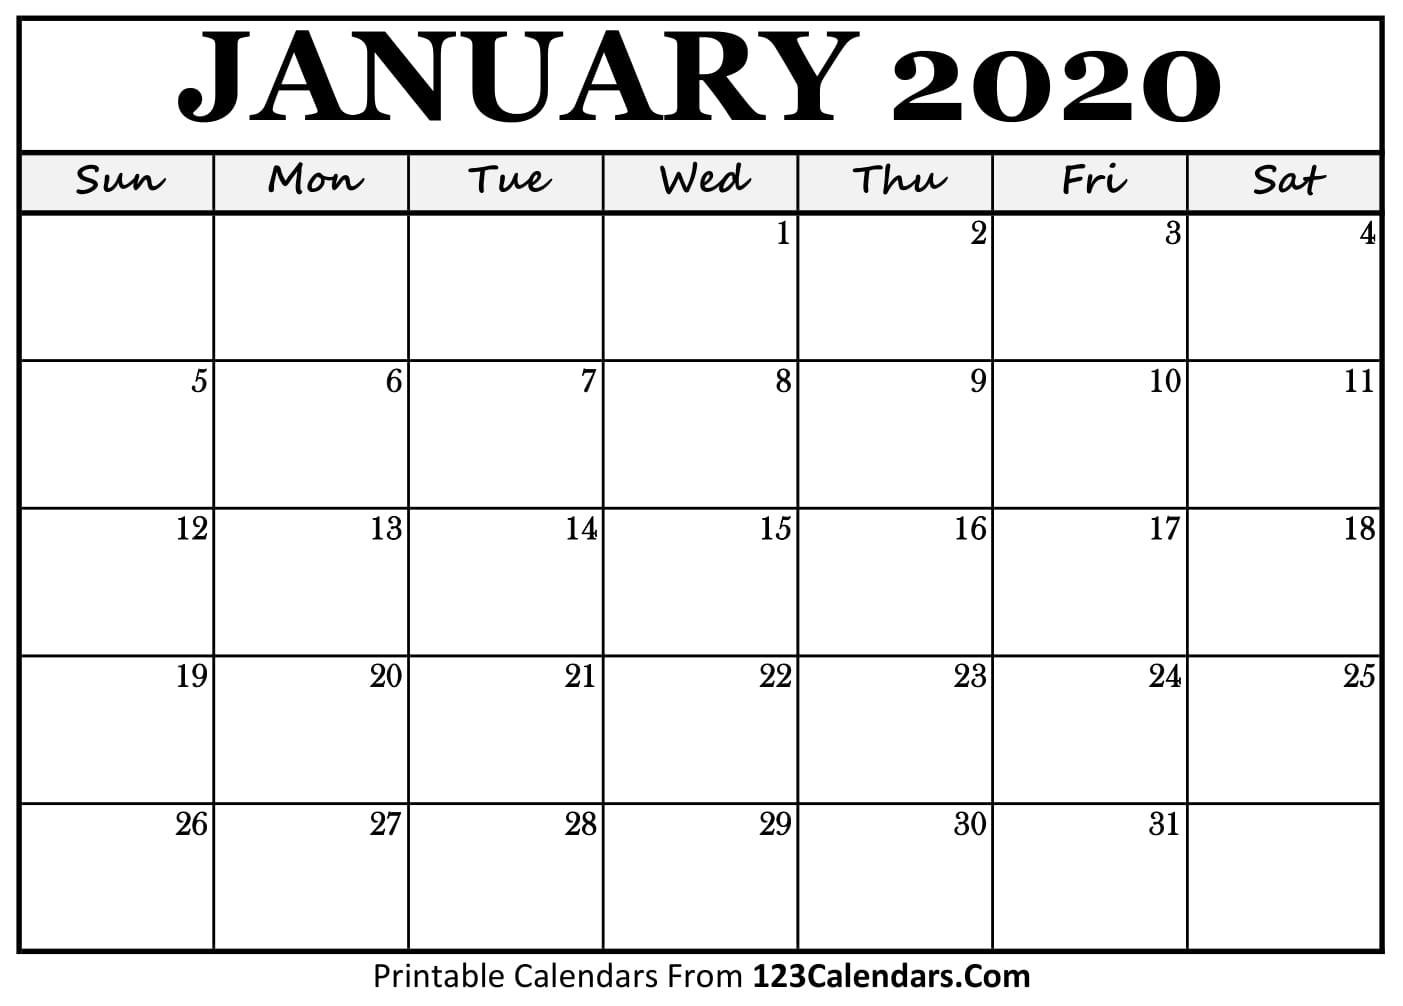 Free Printable Calendar | 123Calendars-Printable Monthly Calendar 2020